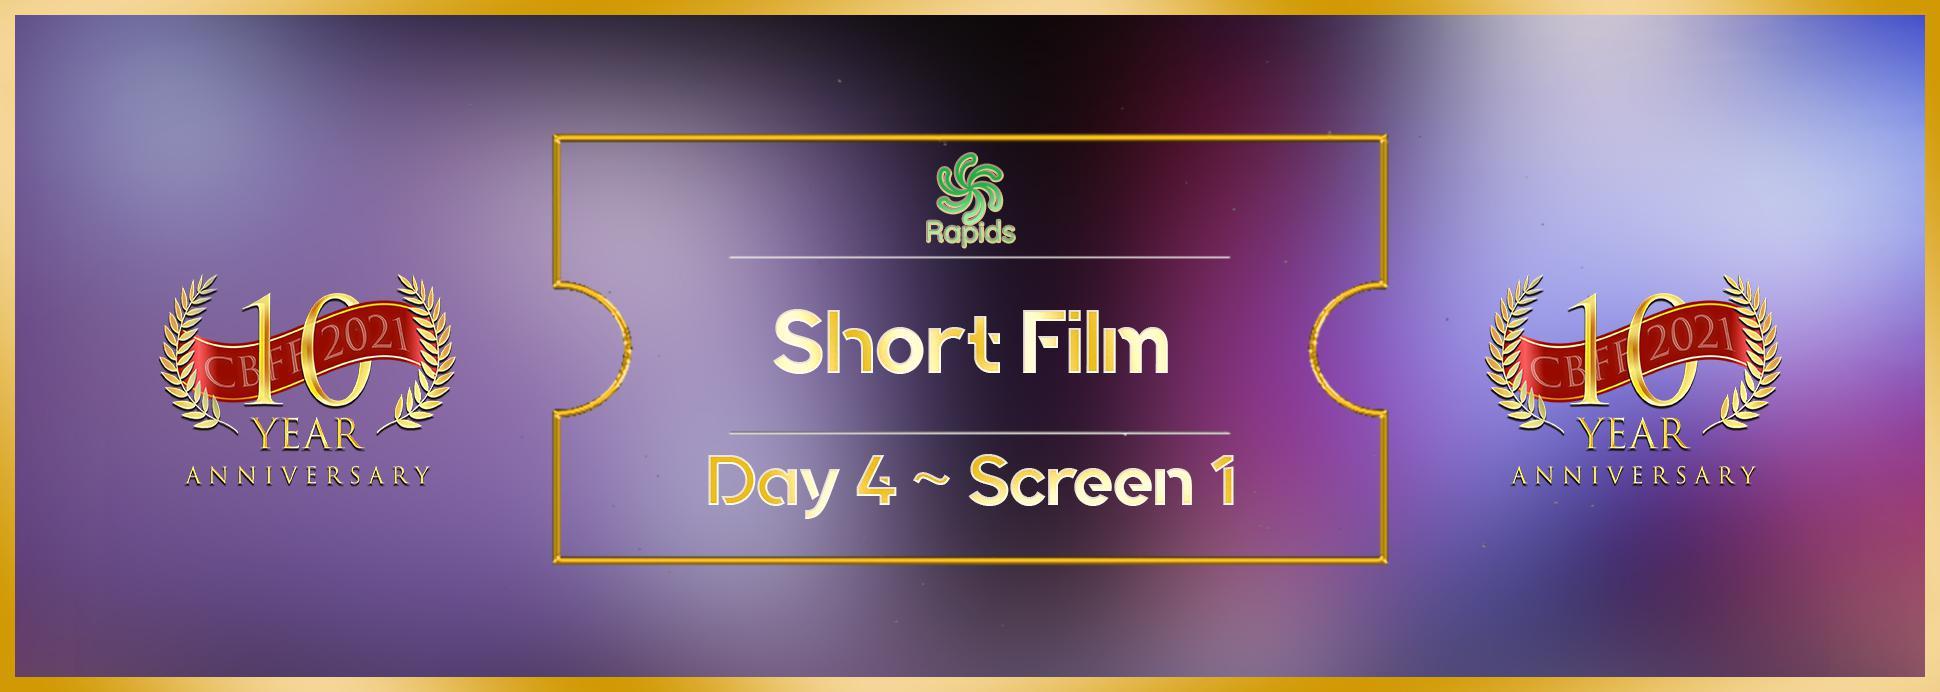 Day 4, Screen 1: Short Film 3